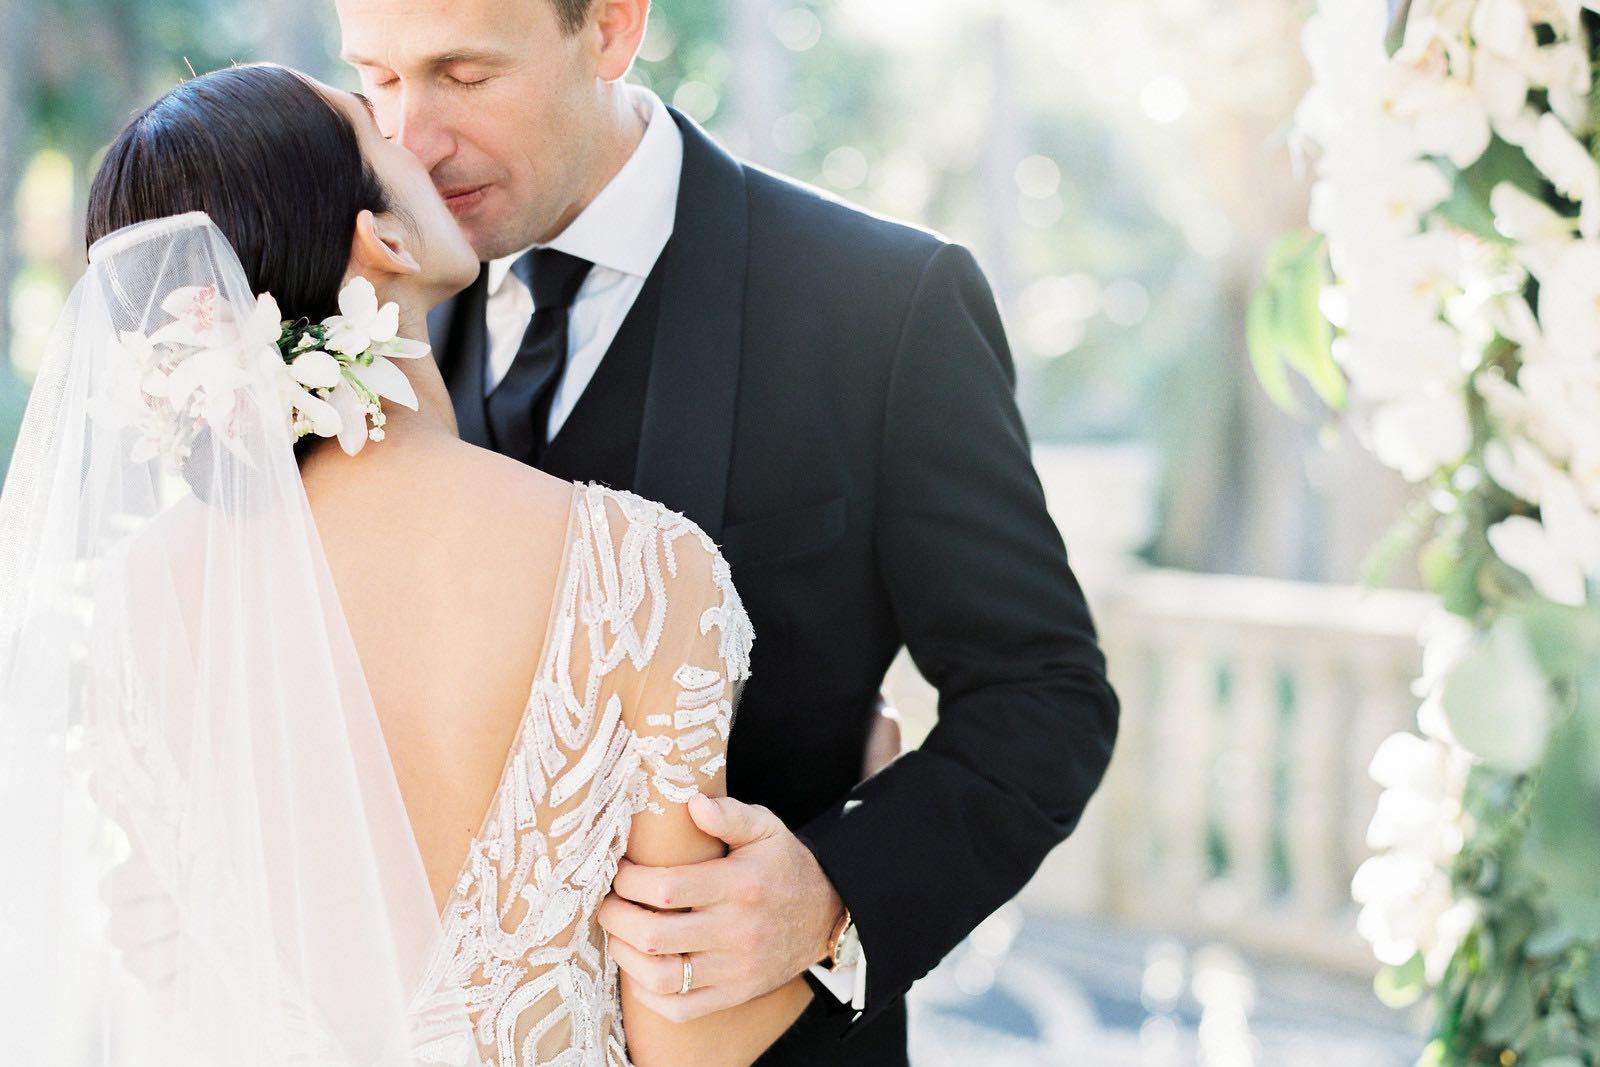 https://www.white-ibiza.com/wp-content/uploads/2020/04/white-ibiza-weddings-photographer-ana-lui-photography-2020-01.jpeg